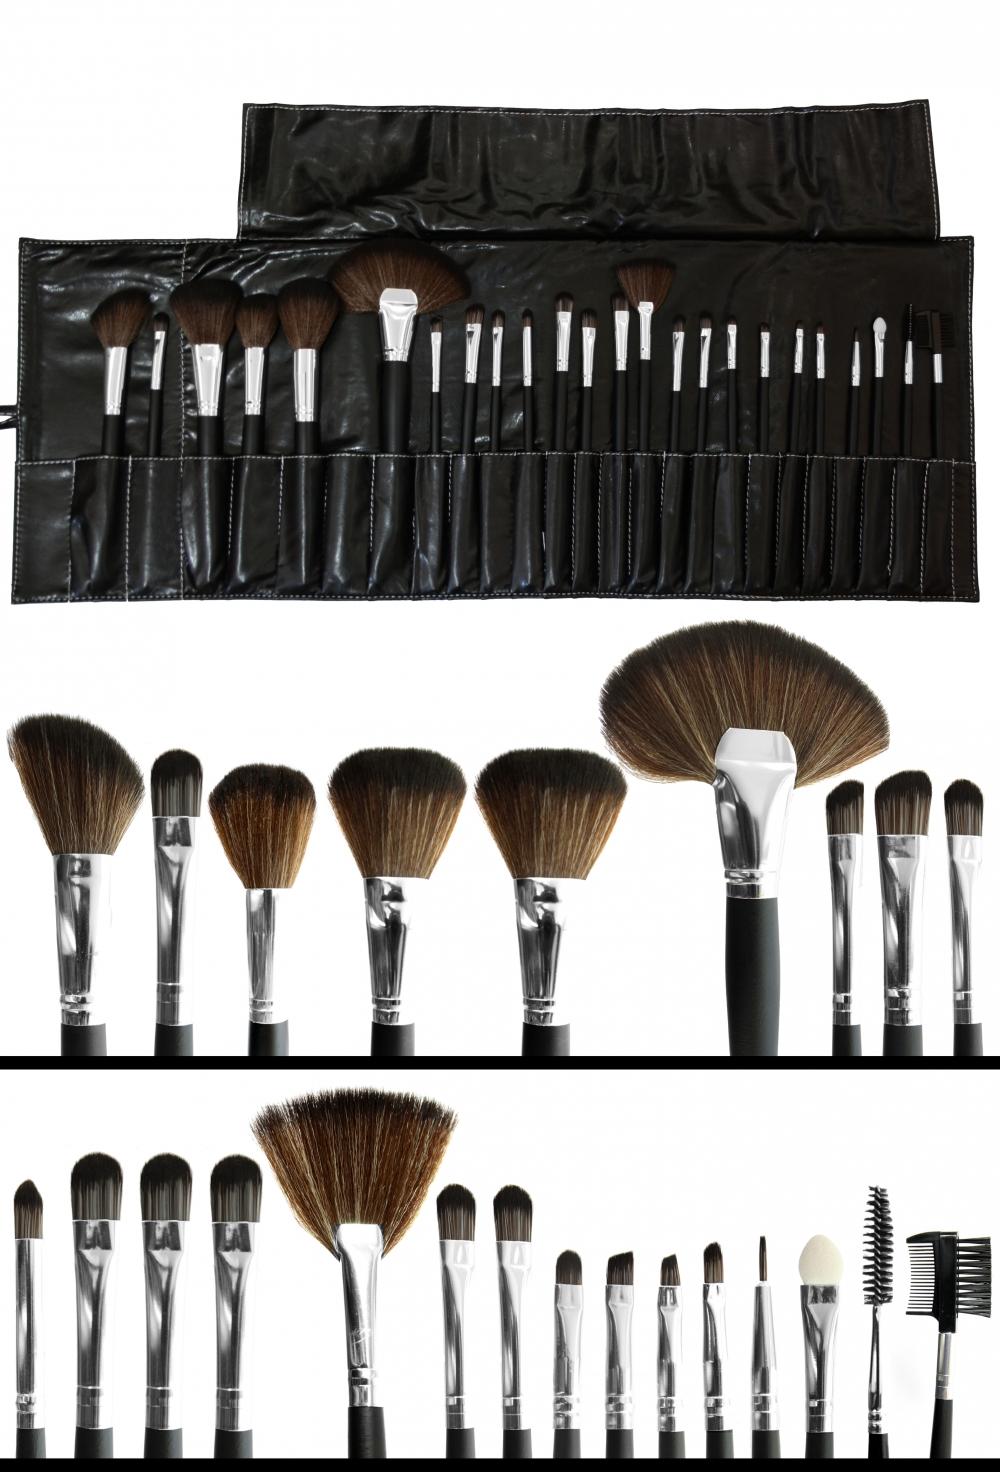 profi make up pinseltasche set theater profi schminke make up. Black Bedroom Furniture Sets. Home Design Ideas